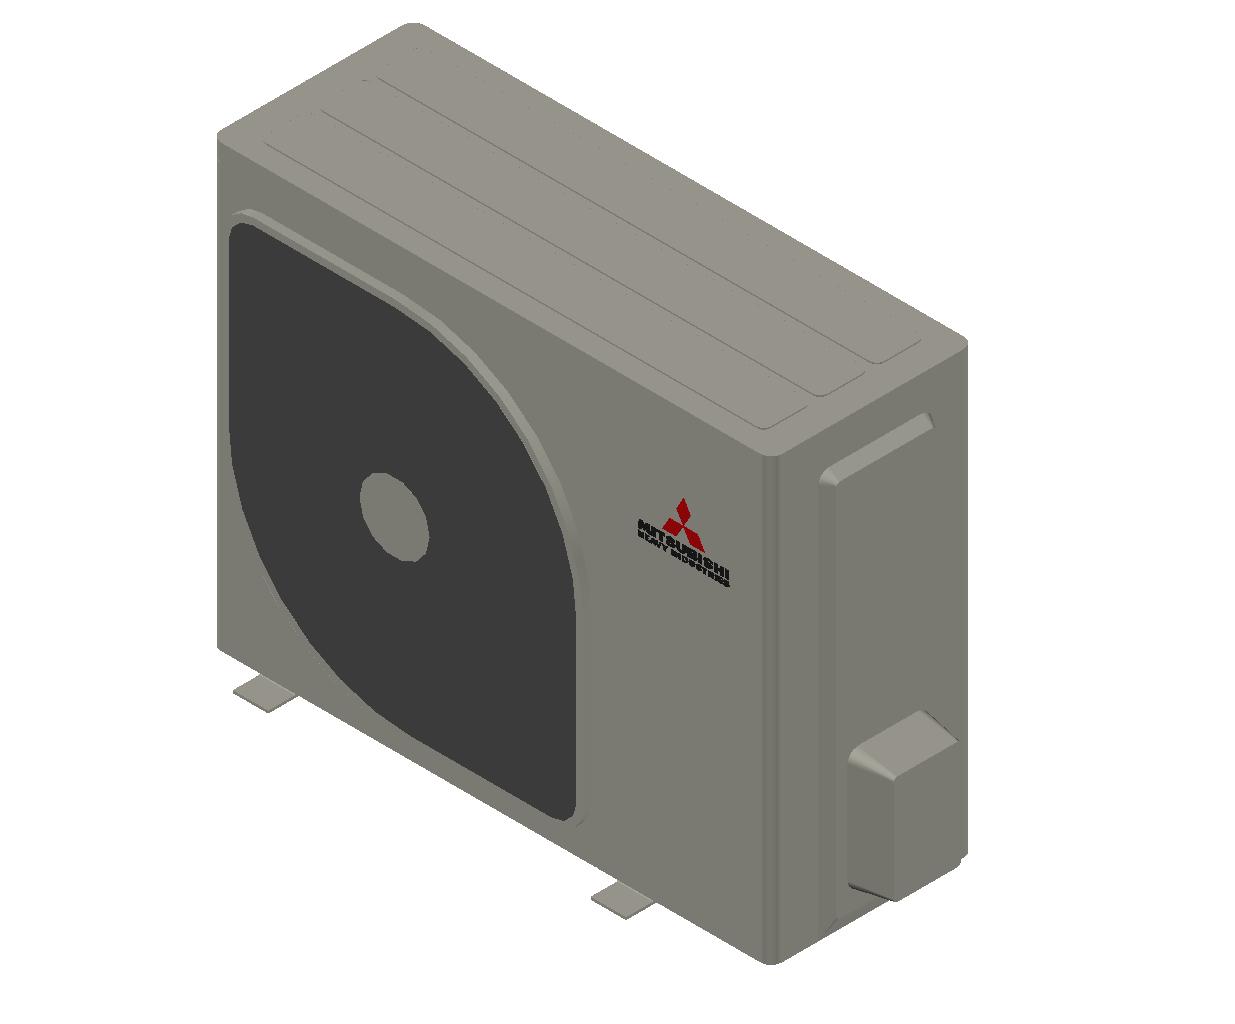 HC_Heat Pump_MEPcontent_Mitsubishi Heavy Industries_PAC-RAC_SRC40ZSX-S_INT-EN.dwg